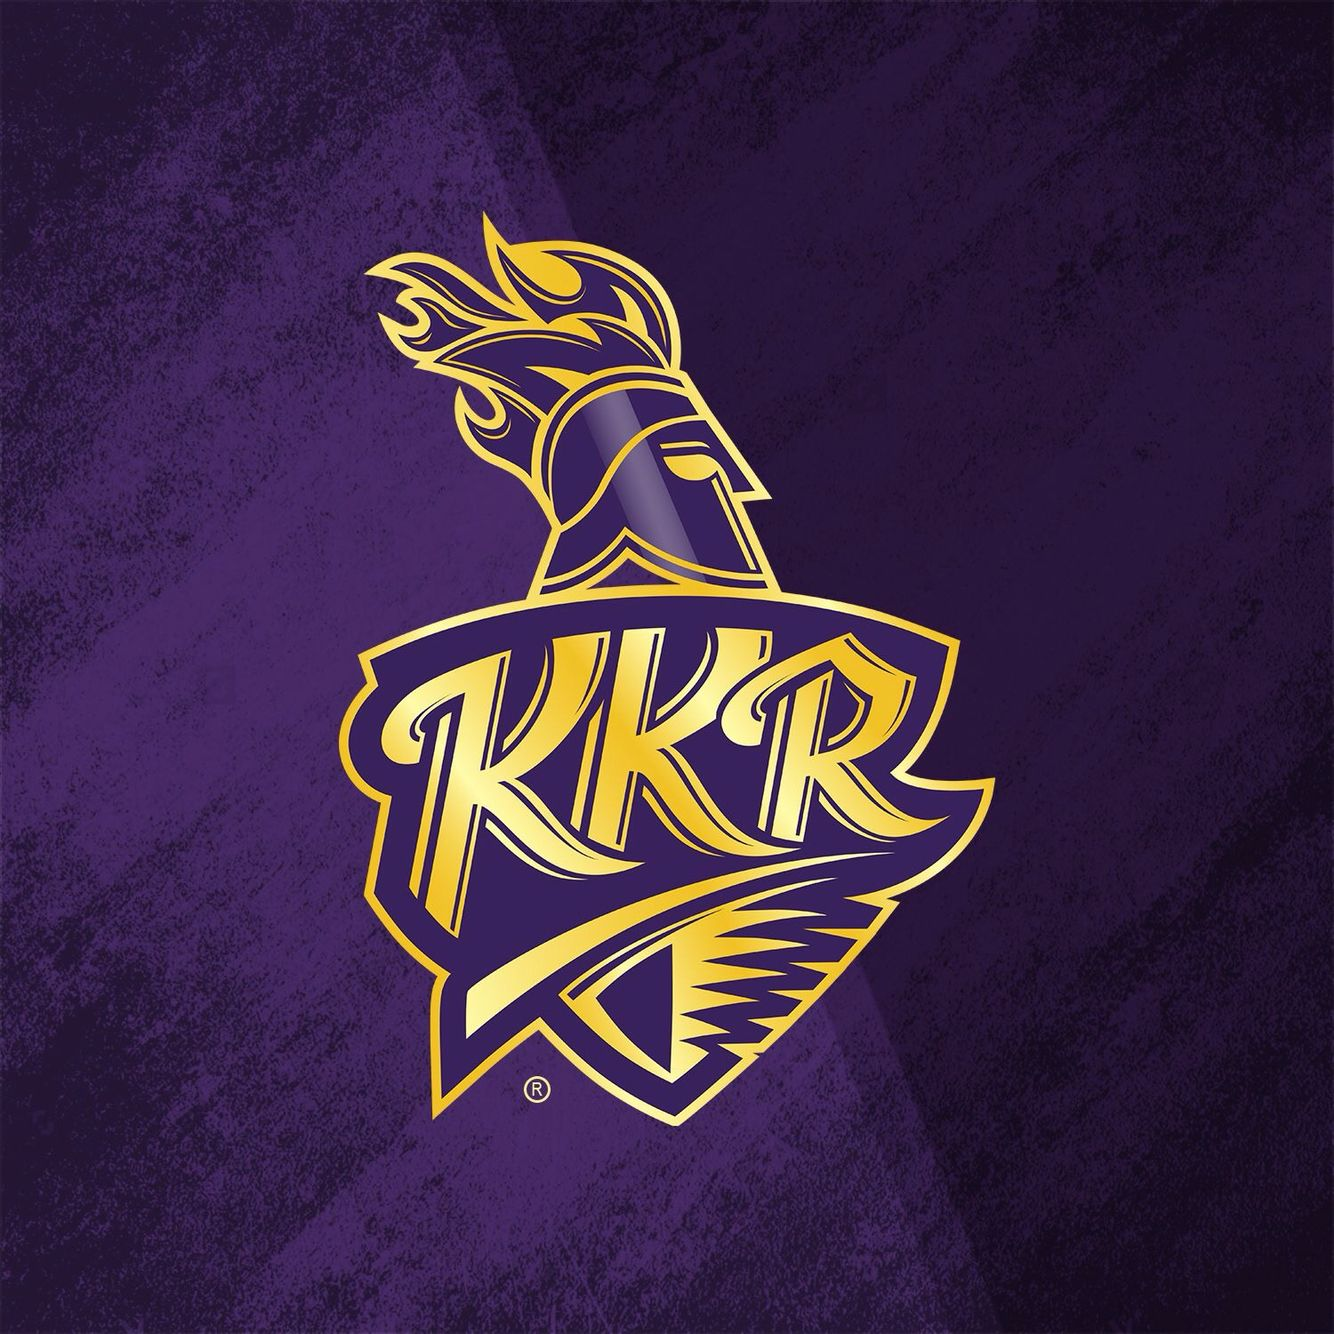 Kkr logo clipart svg royalty free KKR Logo | kkr | Chennai super kings, Mumbai indians, Logos svg royalty free